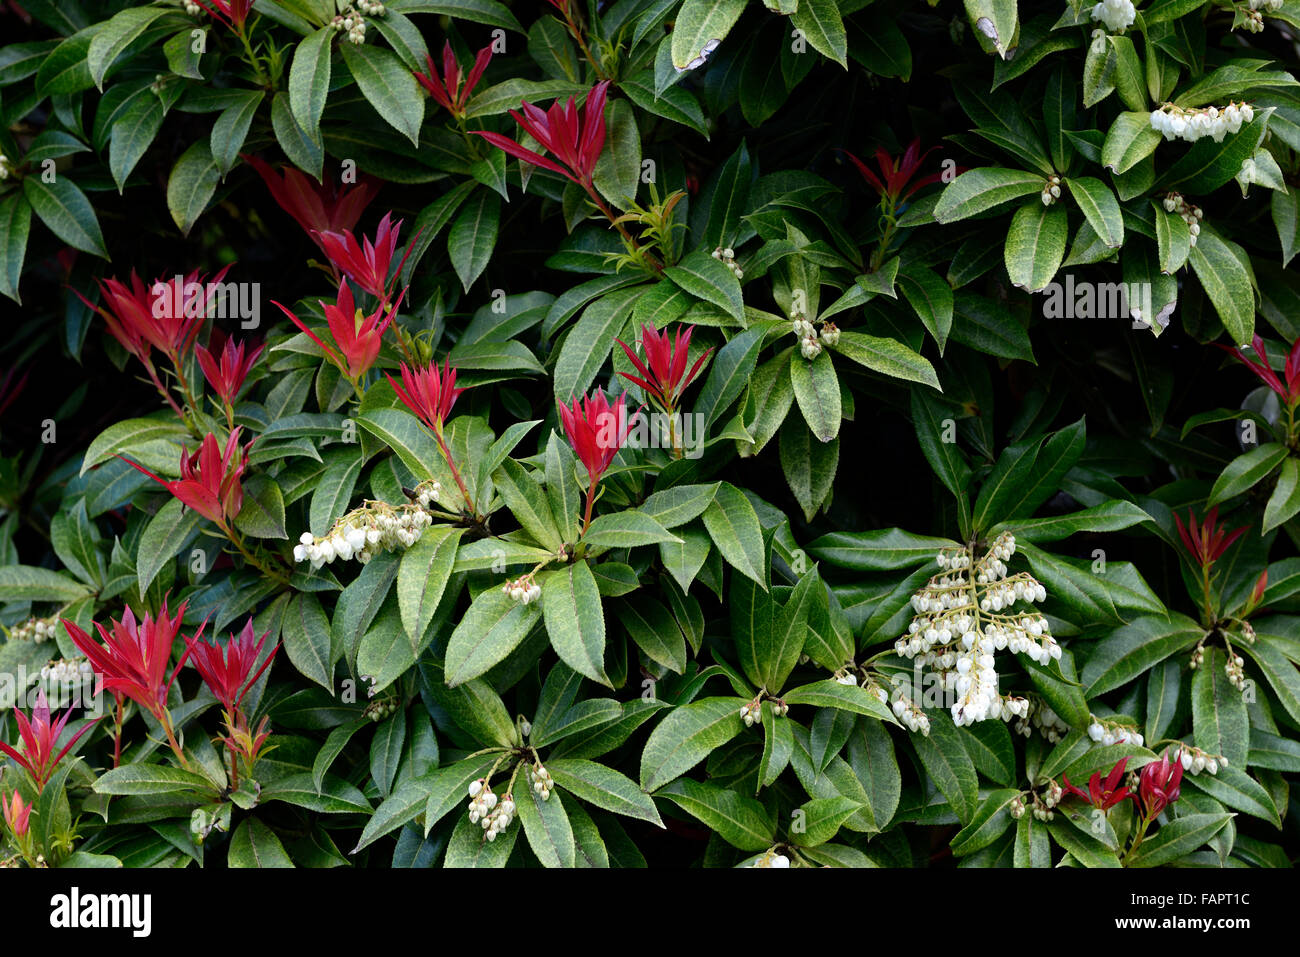 Pieris Formosa Var Forrestii Spring Growth White Flowers Red Leaves